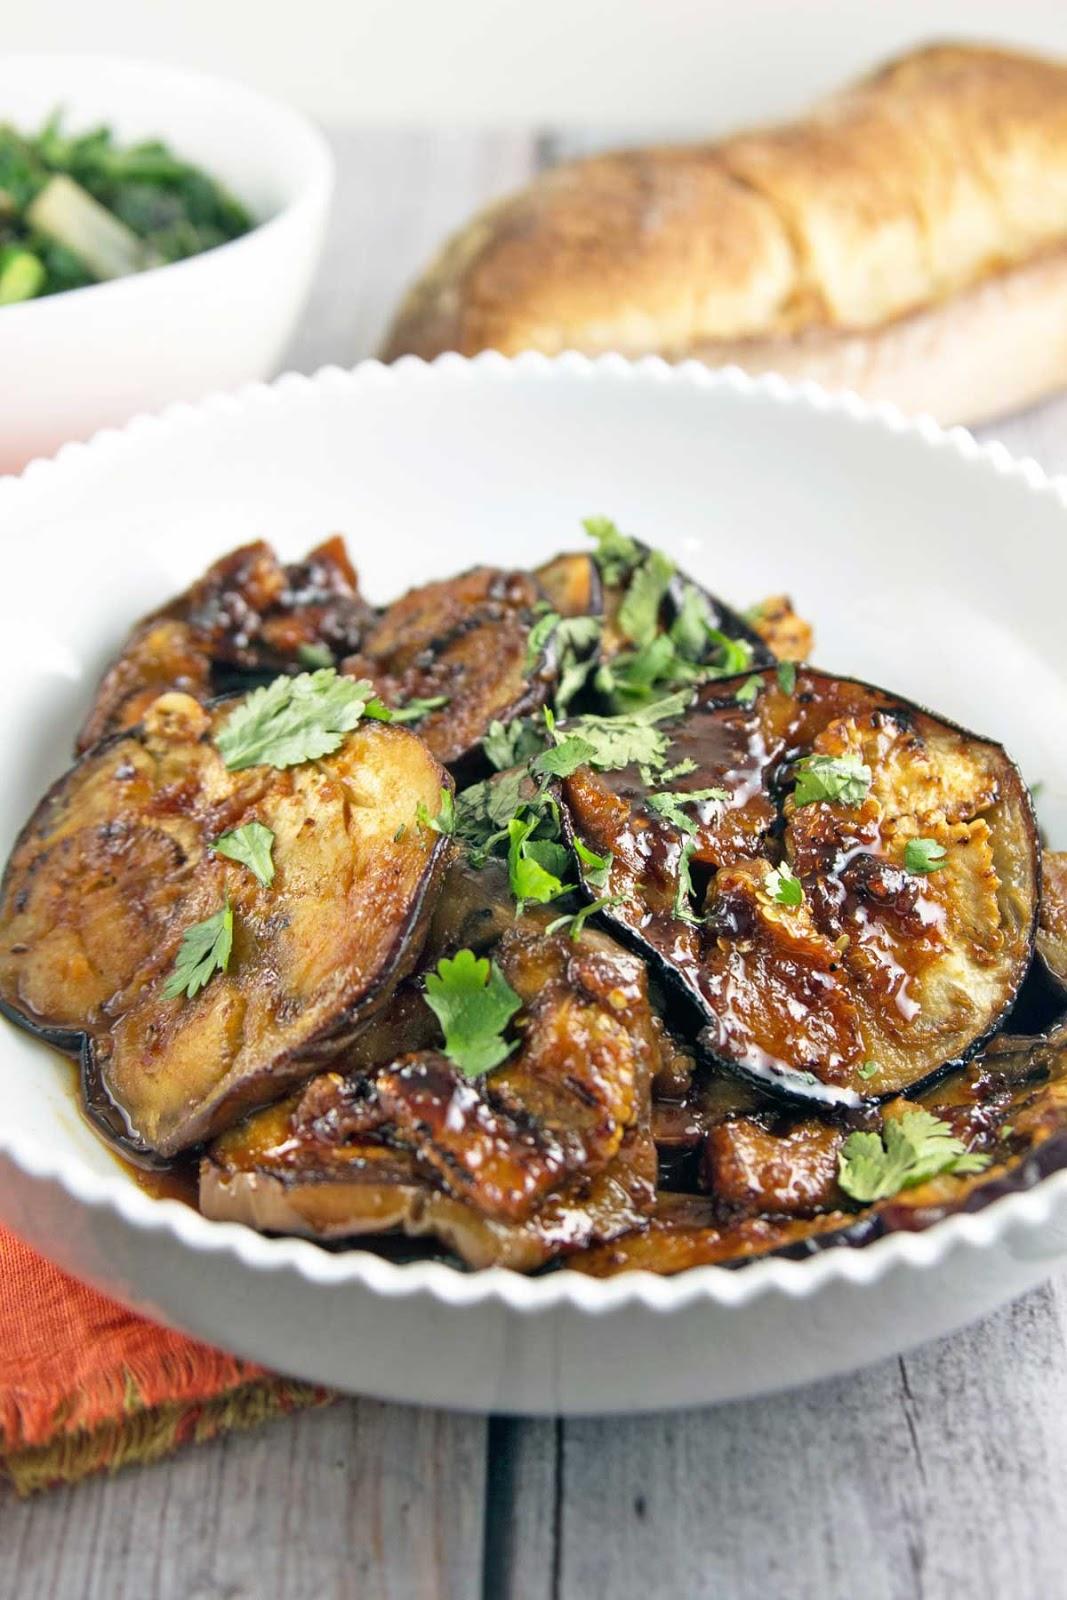 Moroccan Honey Glazed Eggplant_ meltingly soft eggplant, glazed in a sweet and spicy honey and harissa sauce.  Vegan and gluten free!  {Bunsen Burner Bakery}